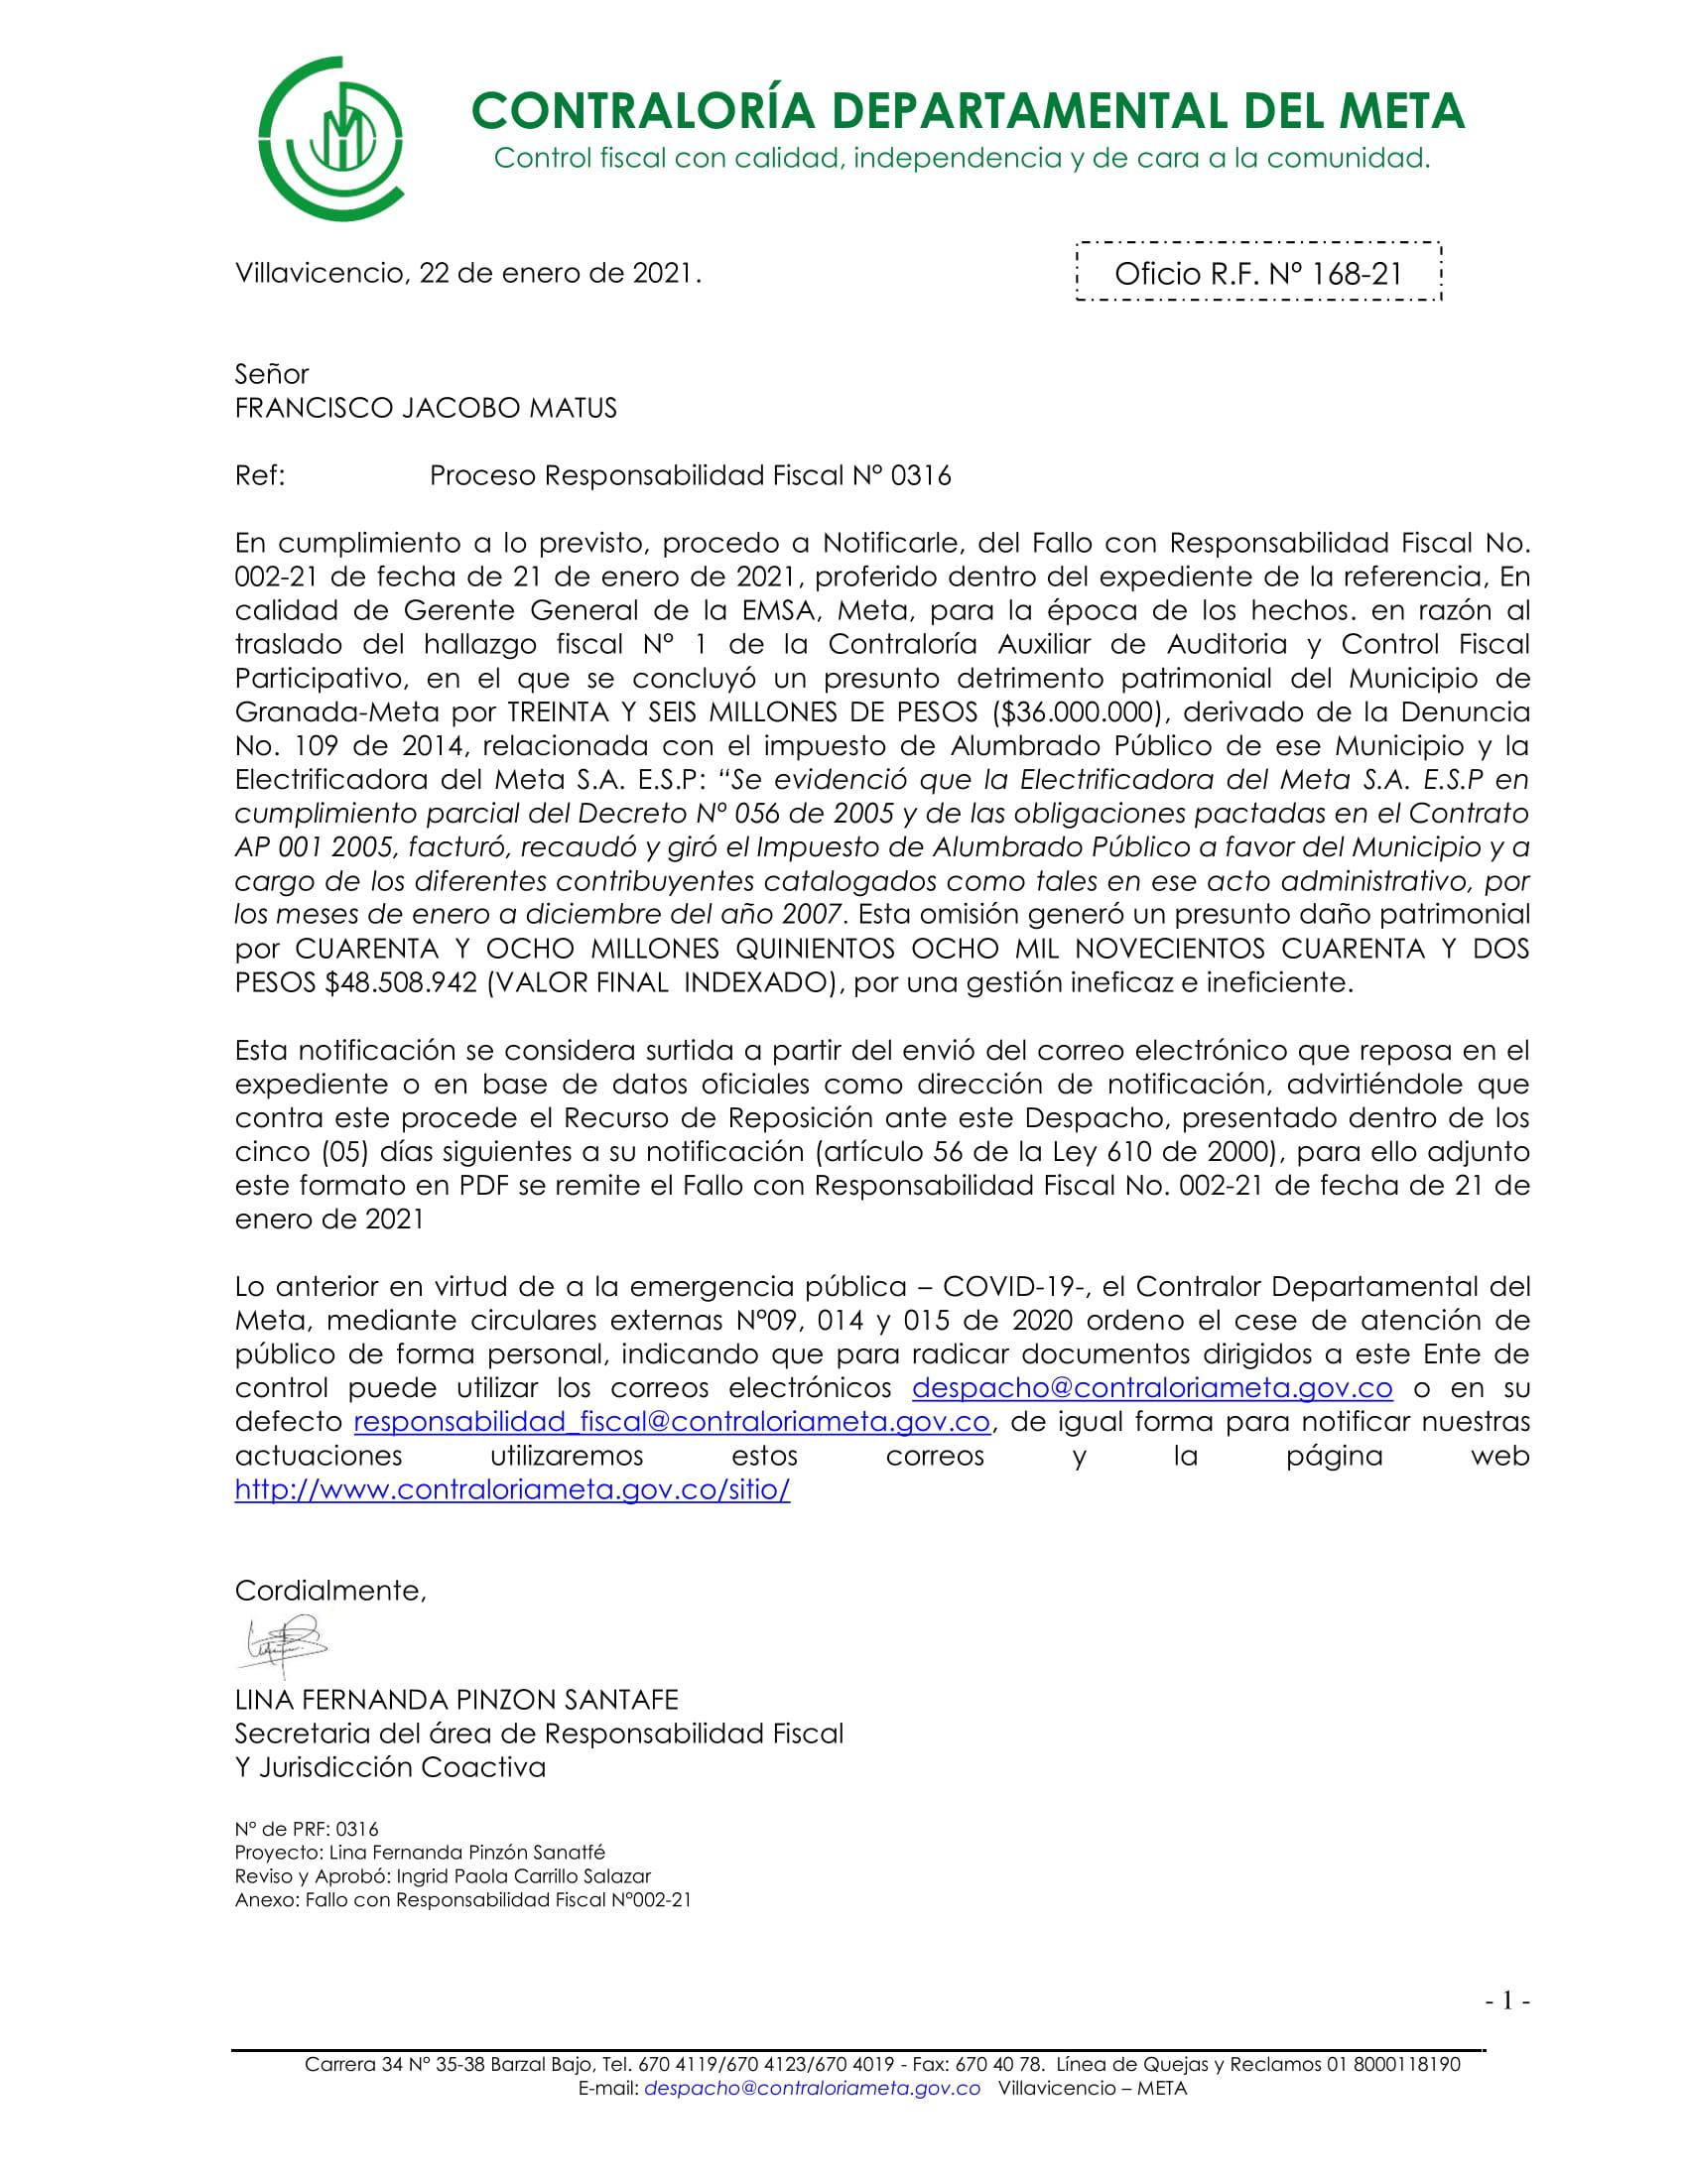 not-por-correo-elec-fallo-de-prf-francisco-jacobo-matus-prf-0316-2-1